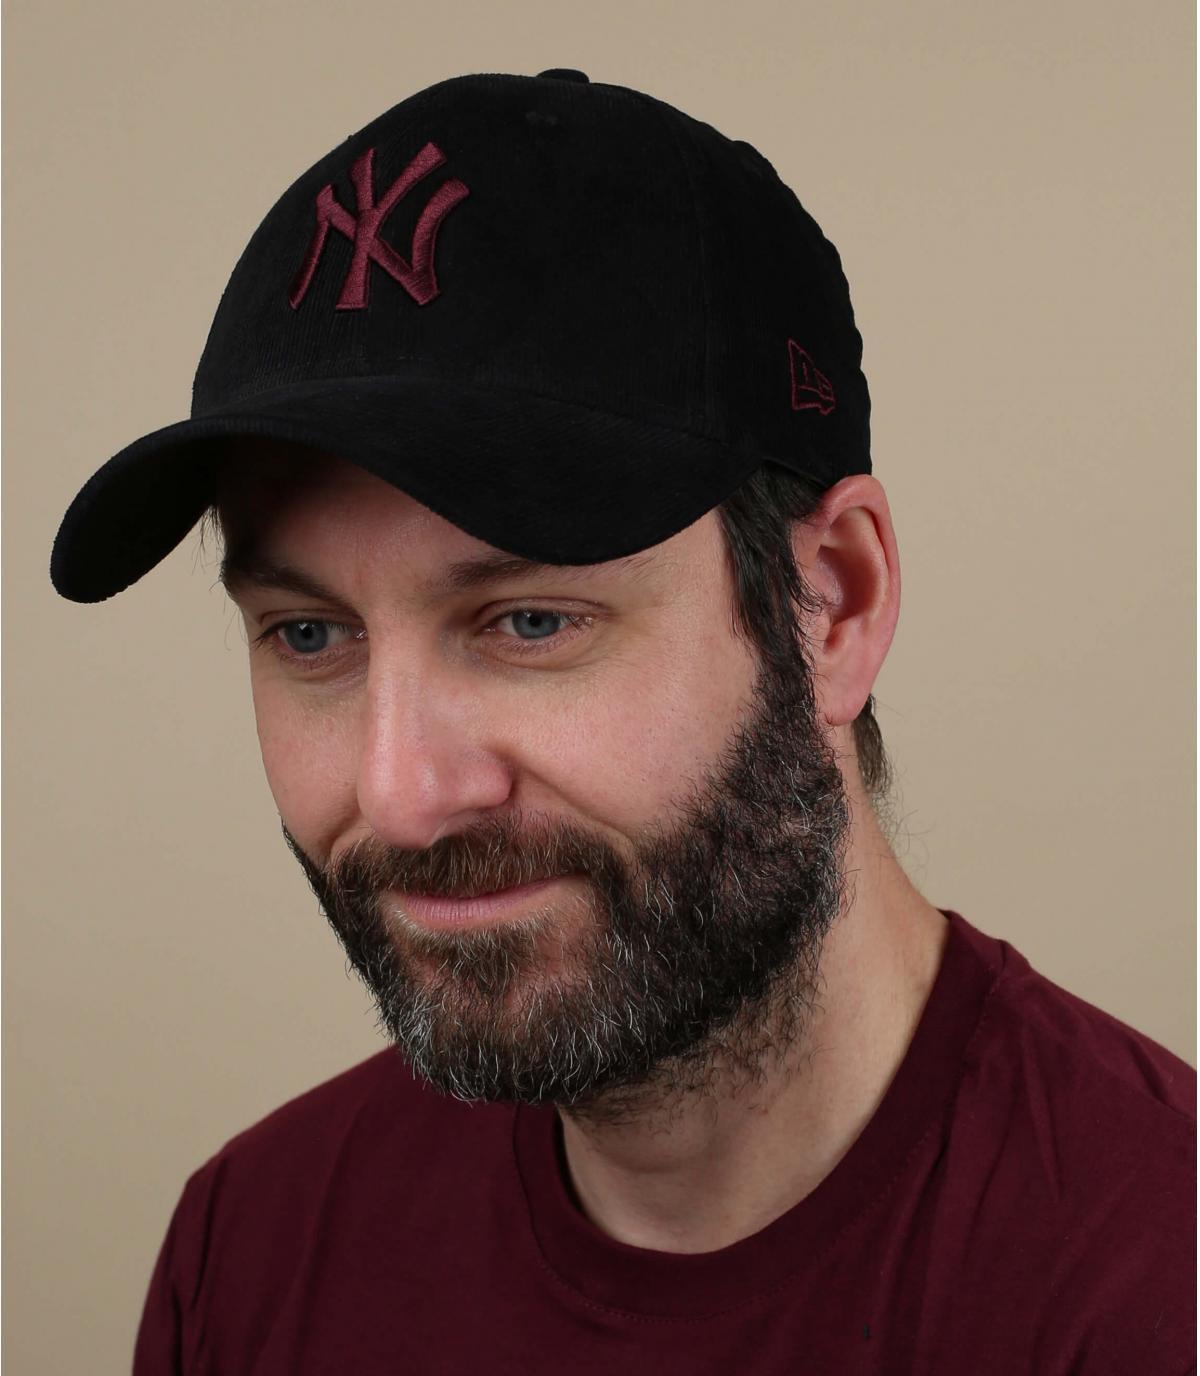 Cappellino NY bordeaux in velluto nero